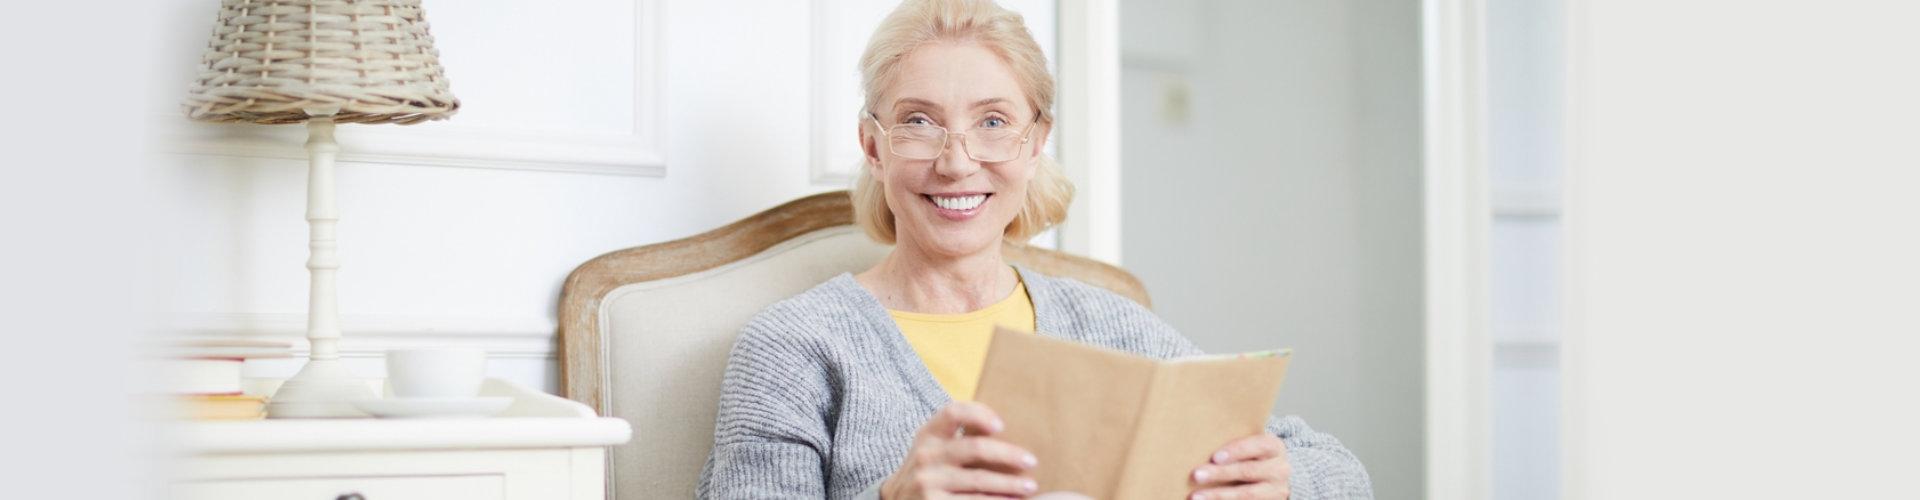 senior woman holding a book